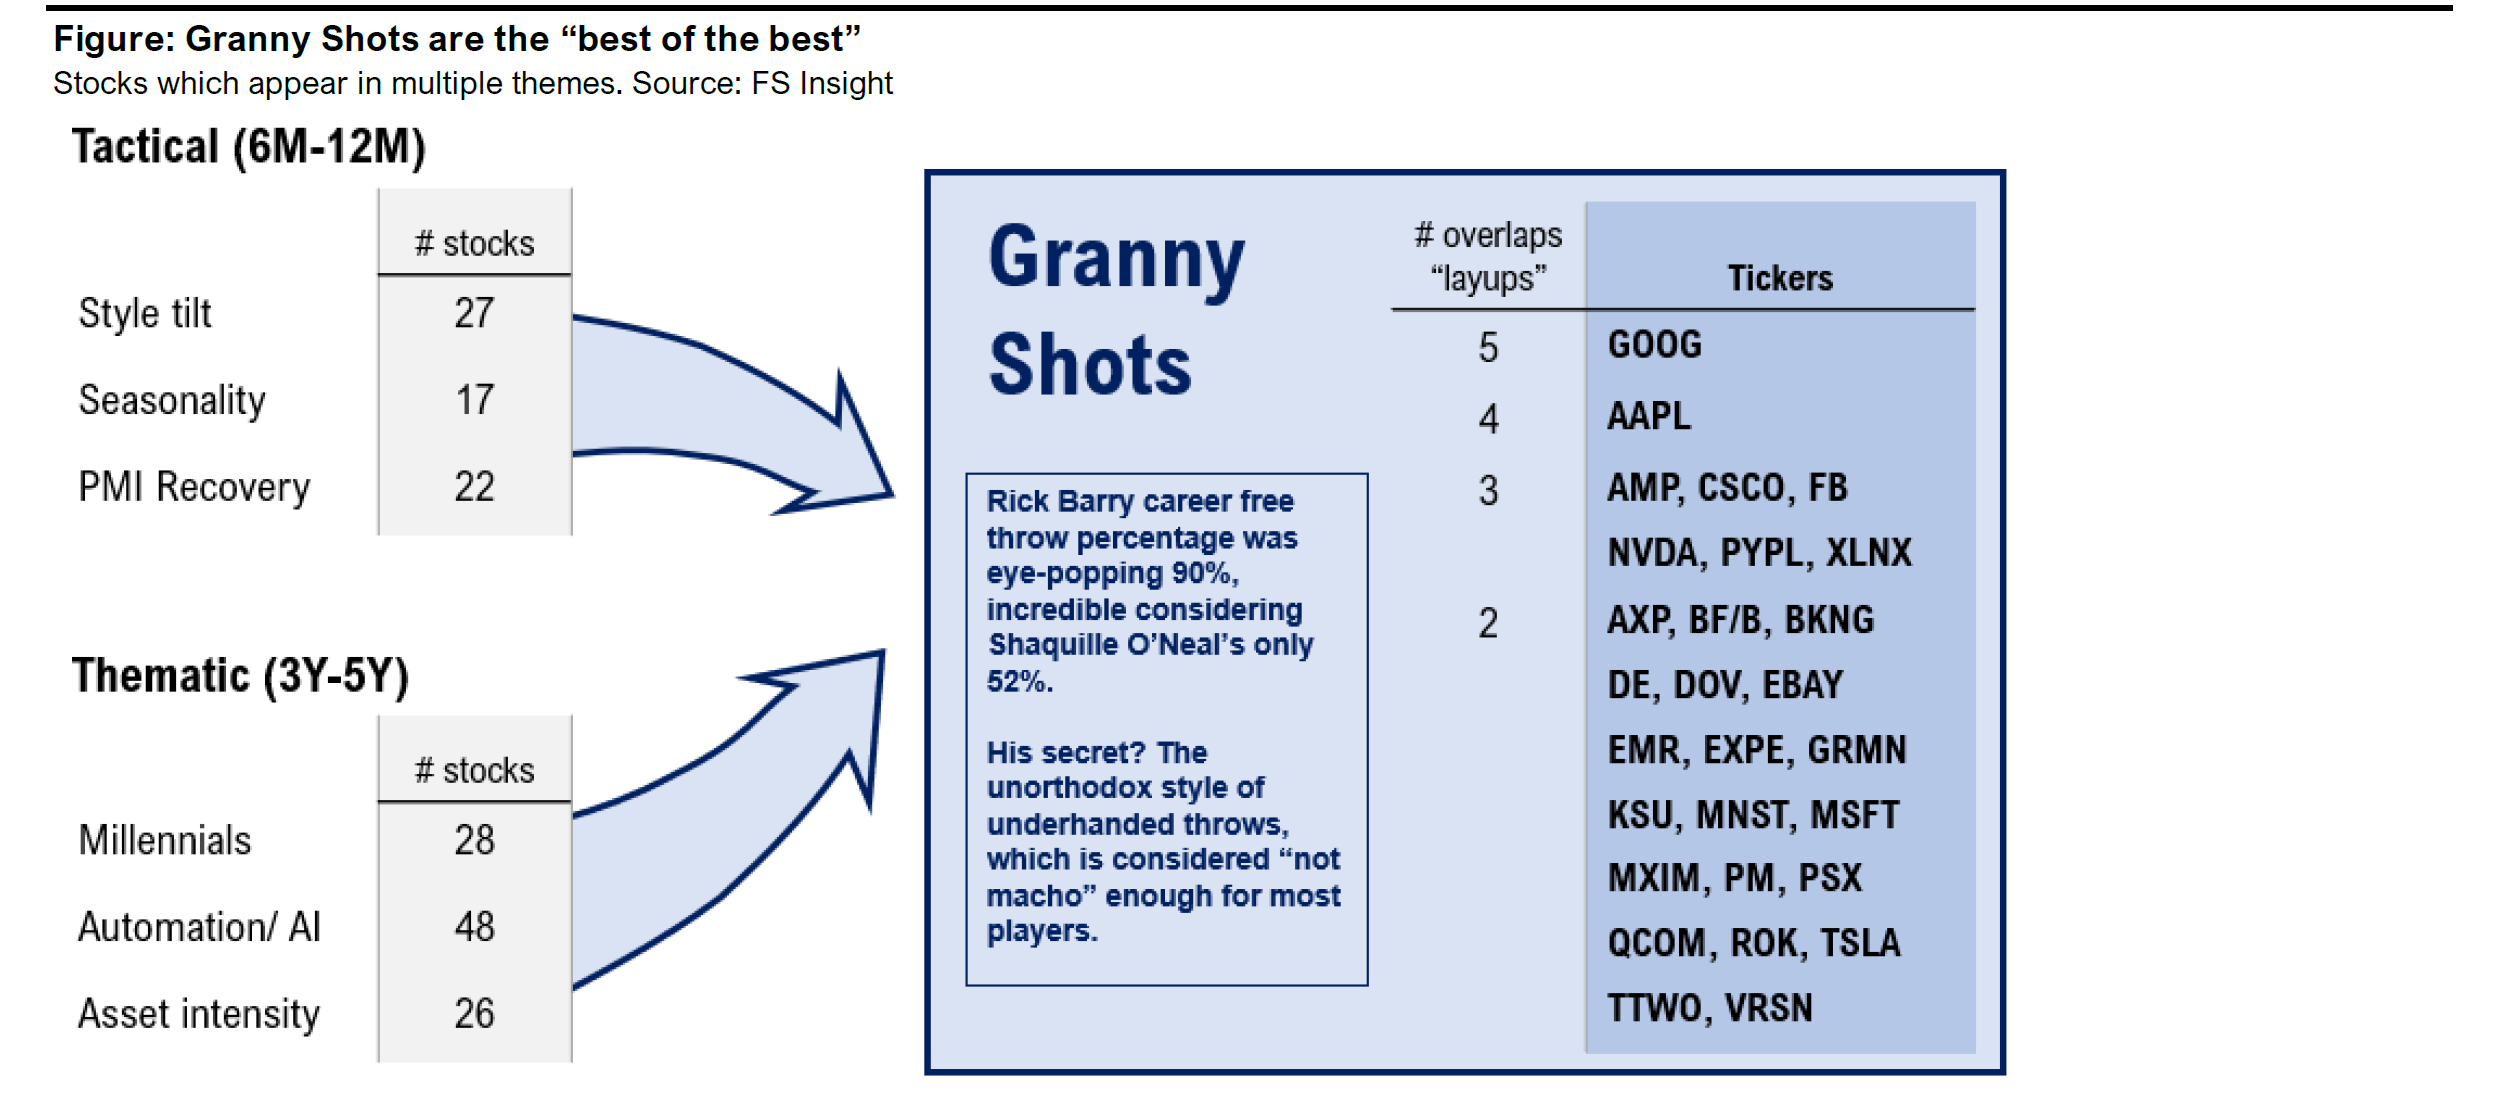 GRANNY SHOTS: Best bets in 2020 - Week 17